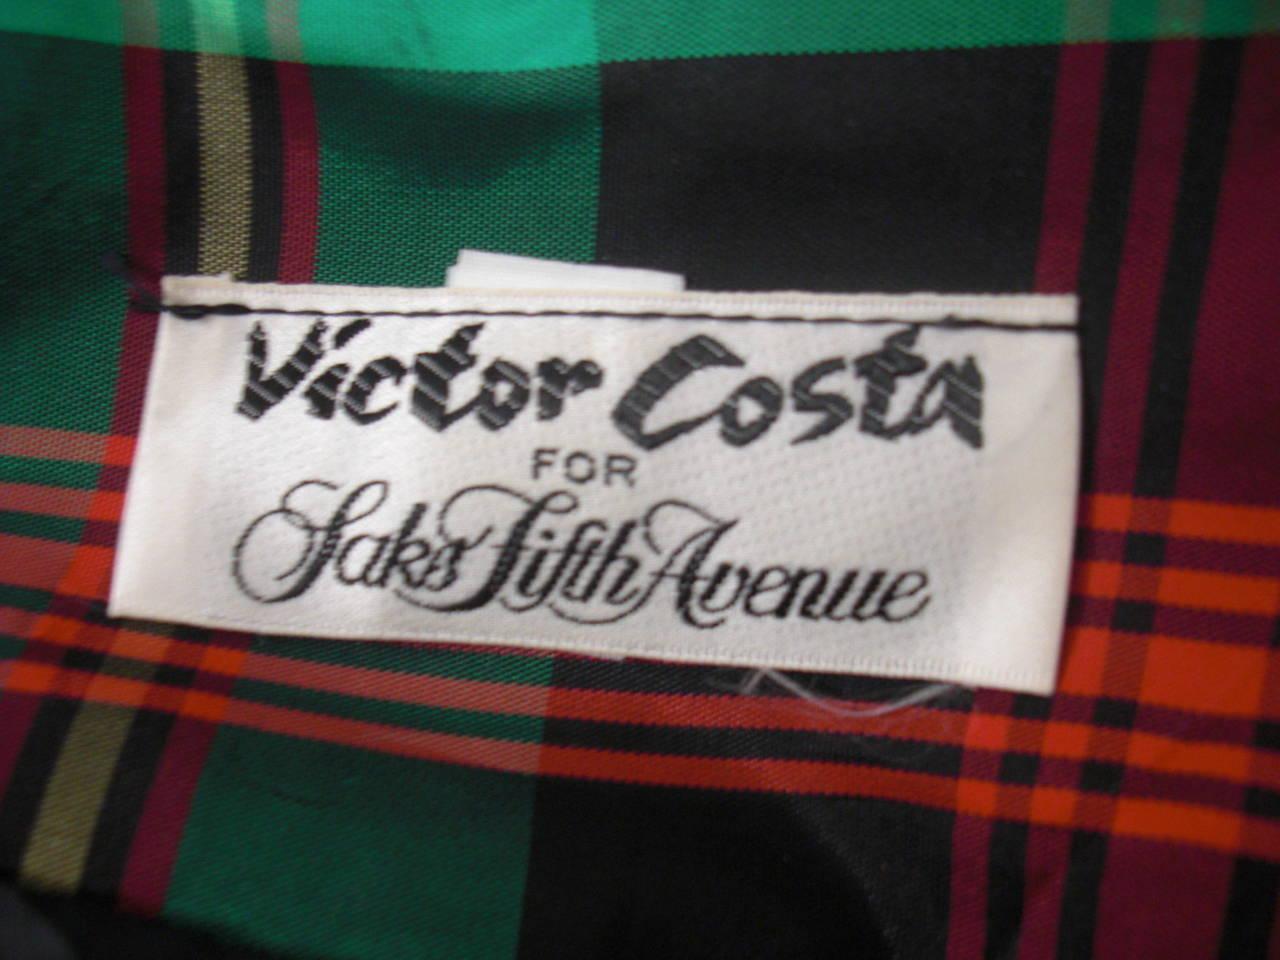 Victor Costa for SAKS 5th Avenue Green Plaid and Velvet Dress 8